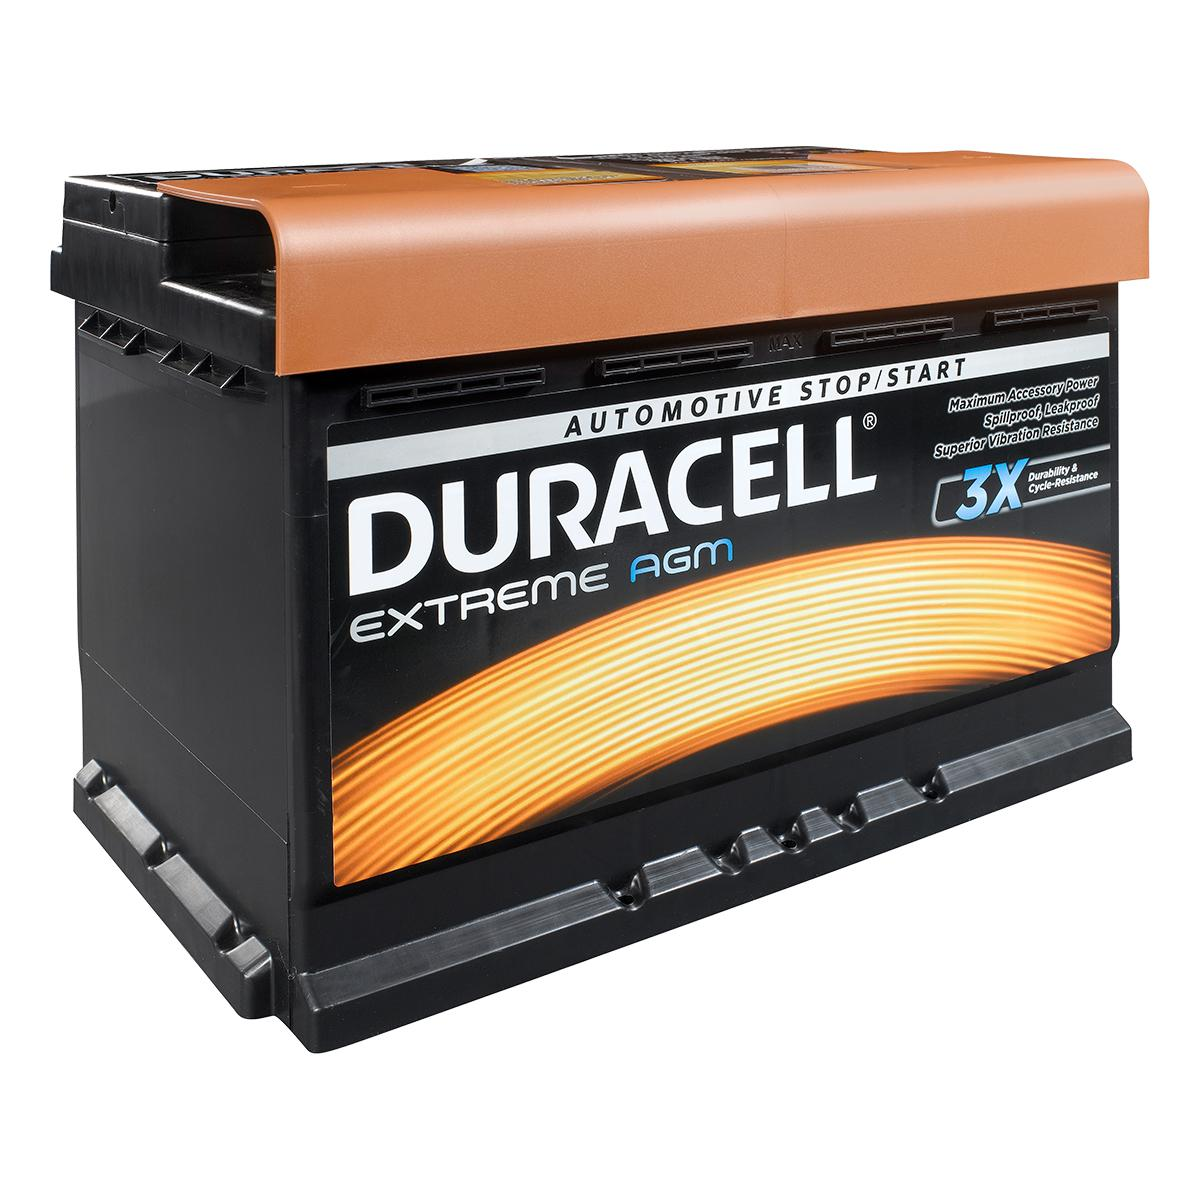 Duracell 110 / DE80 AGM Extreme Car Battery